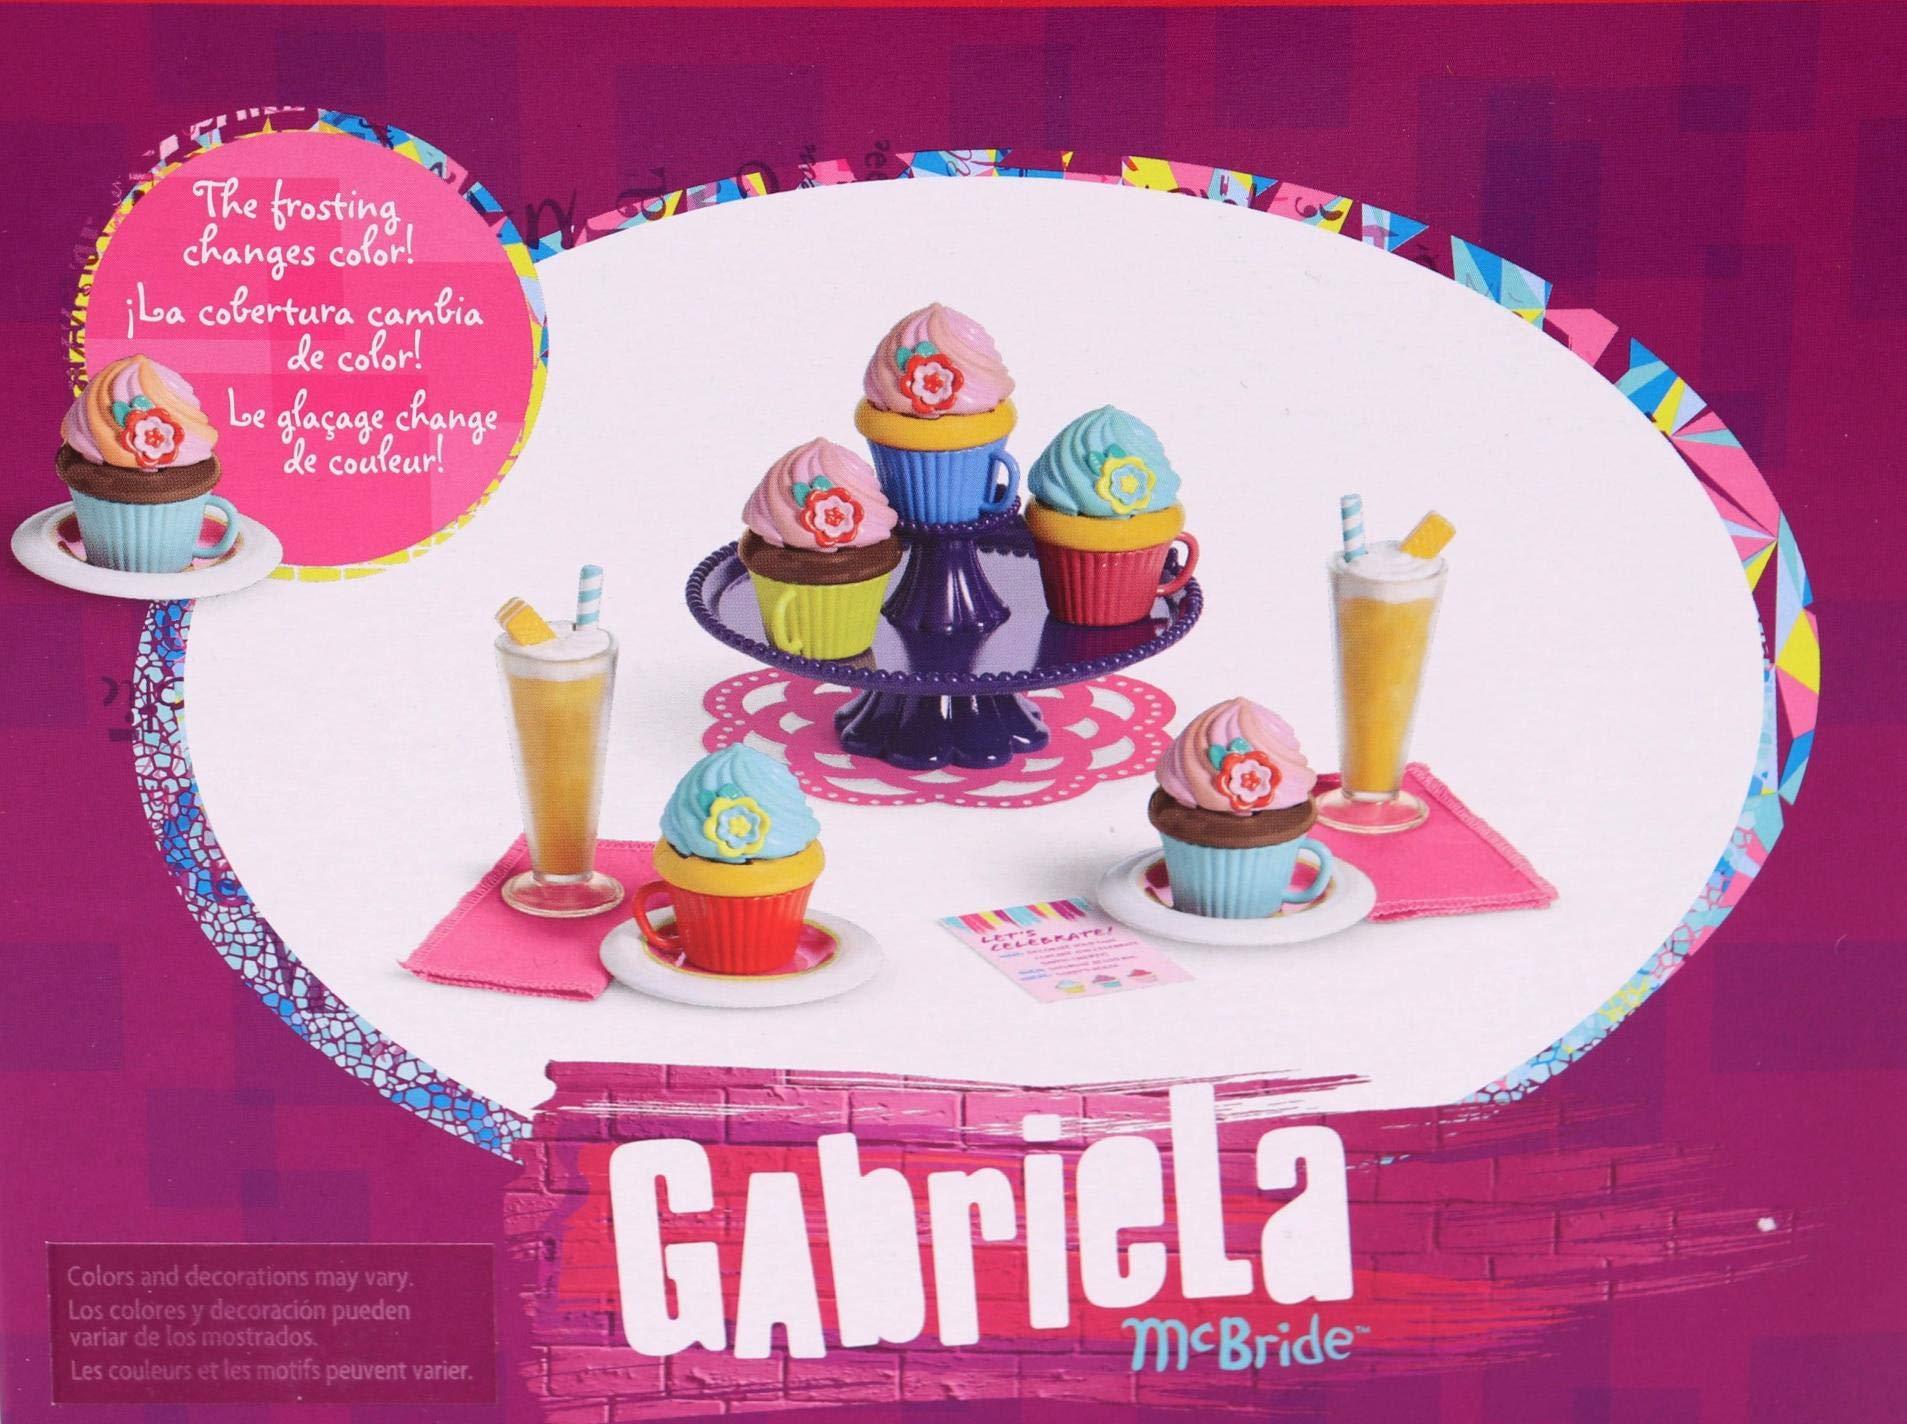 American Girl - Gabriela McBride - Gabriela's Colorful Cupcake Set for 18-inch Dolls - American Girl of 2017